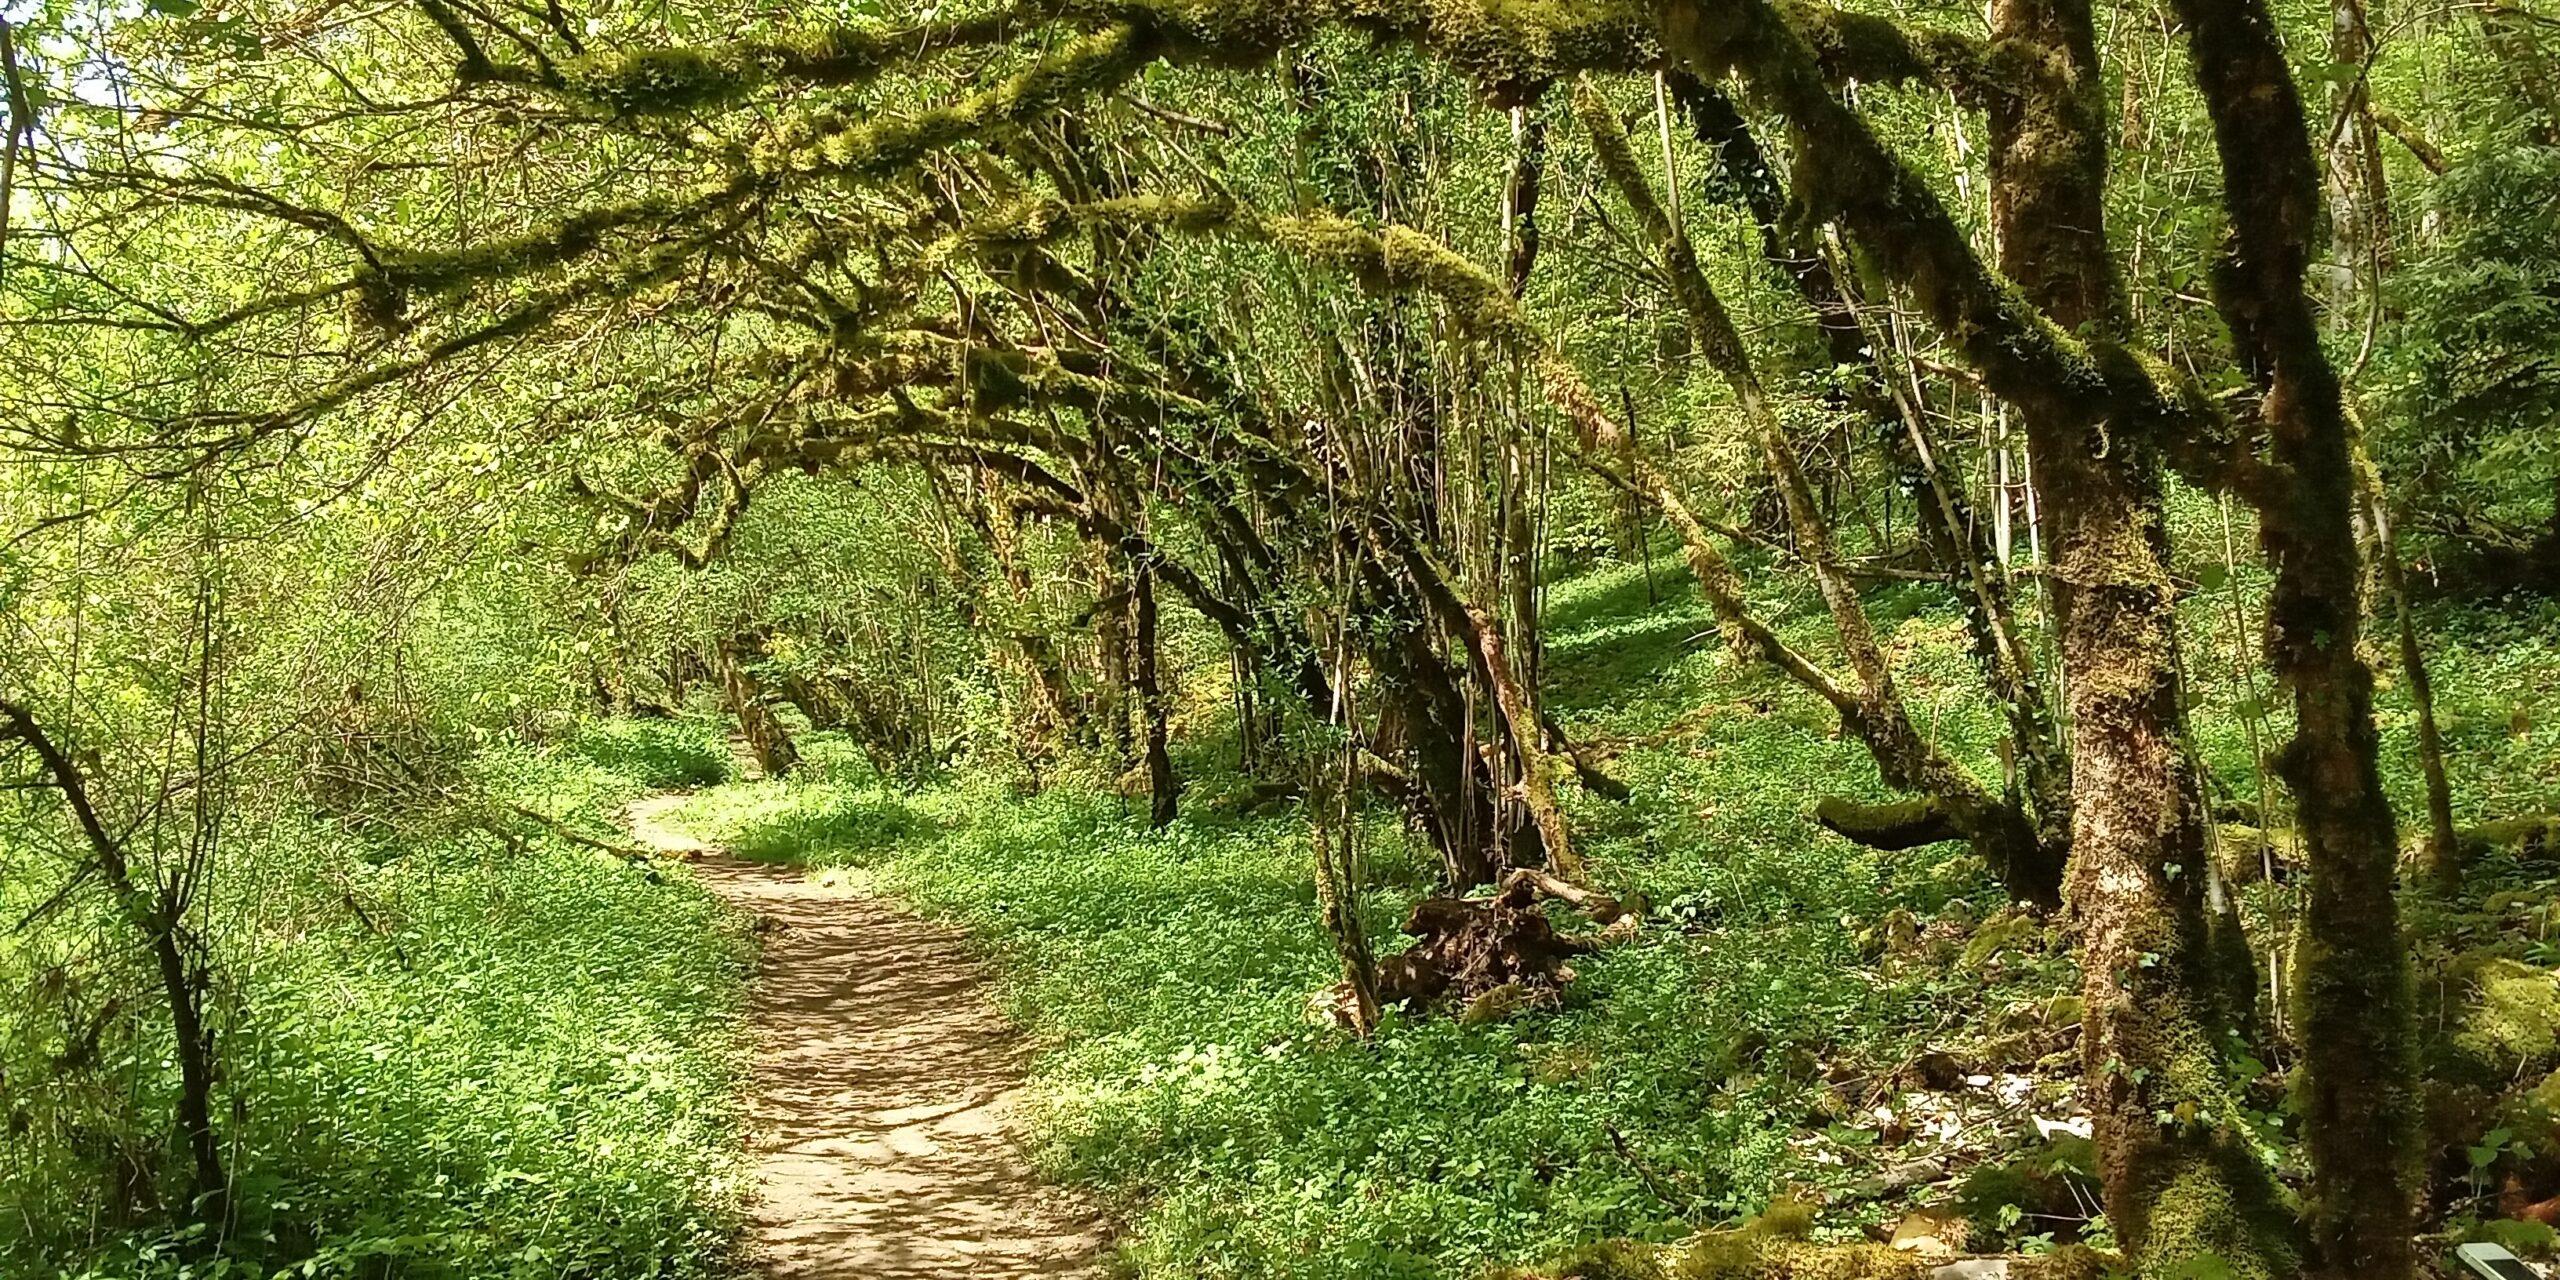 Wanderweg der Route 2 und 95 entlang des Doubs JU